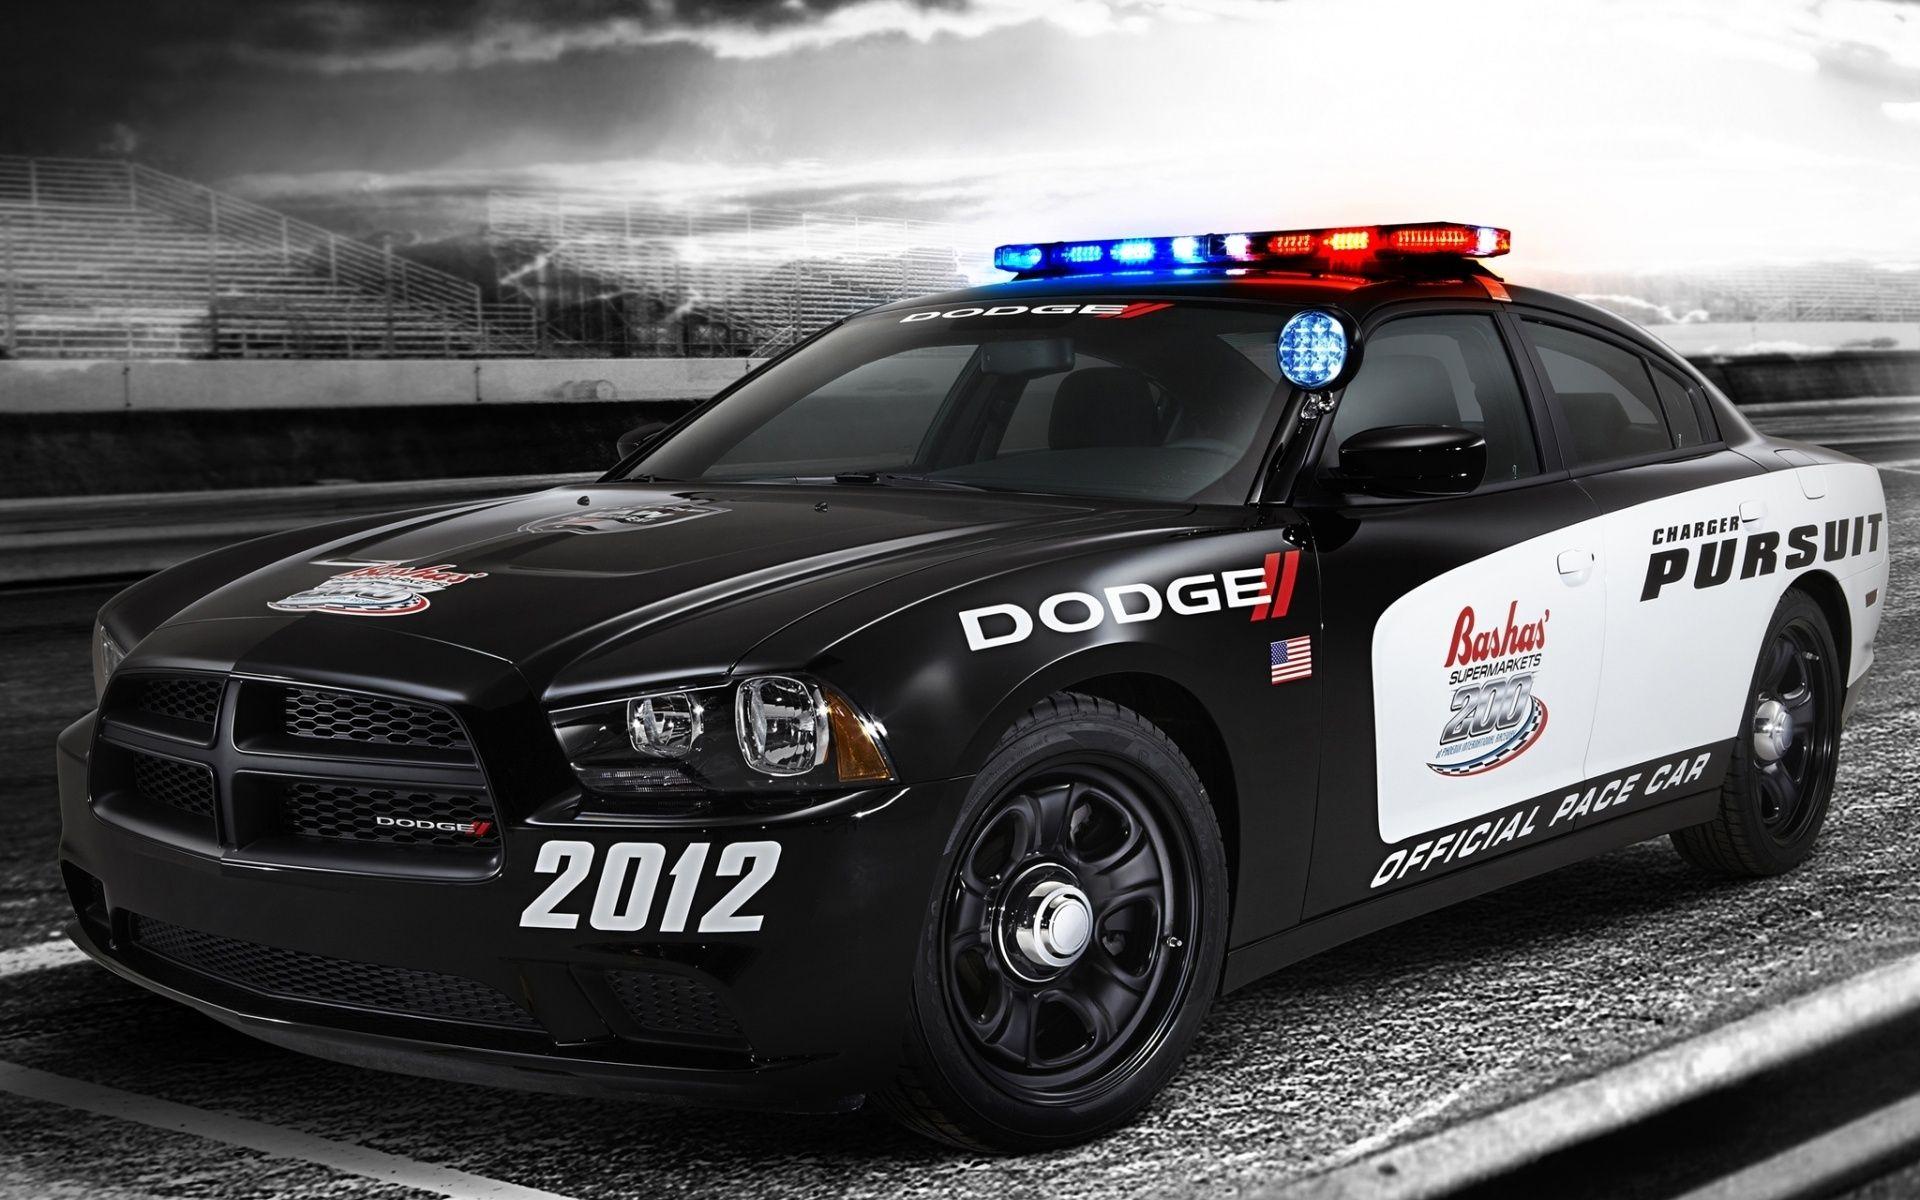 Usa dodge charger police car